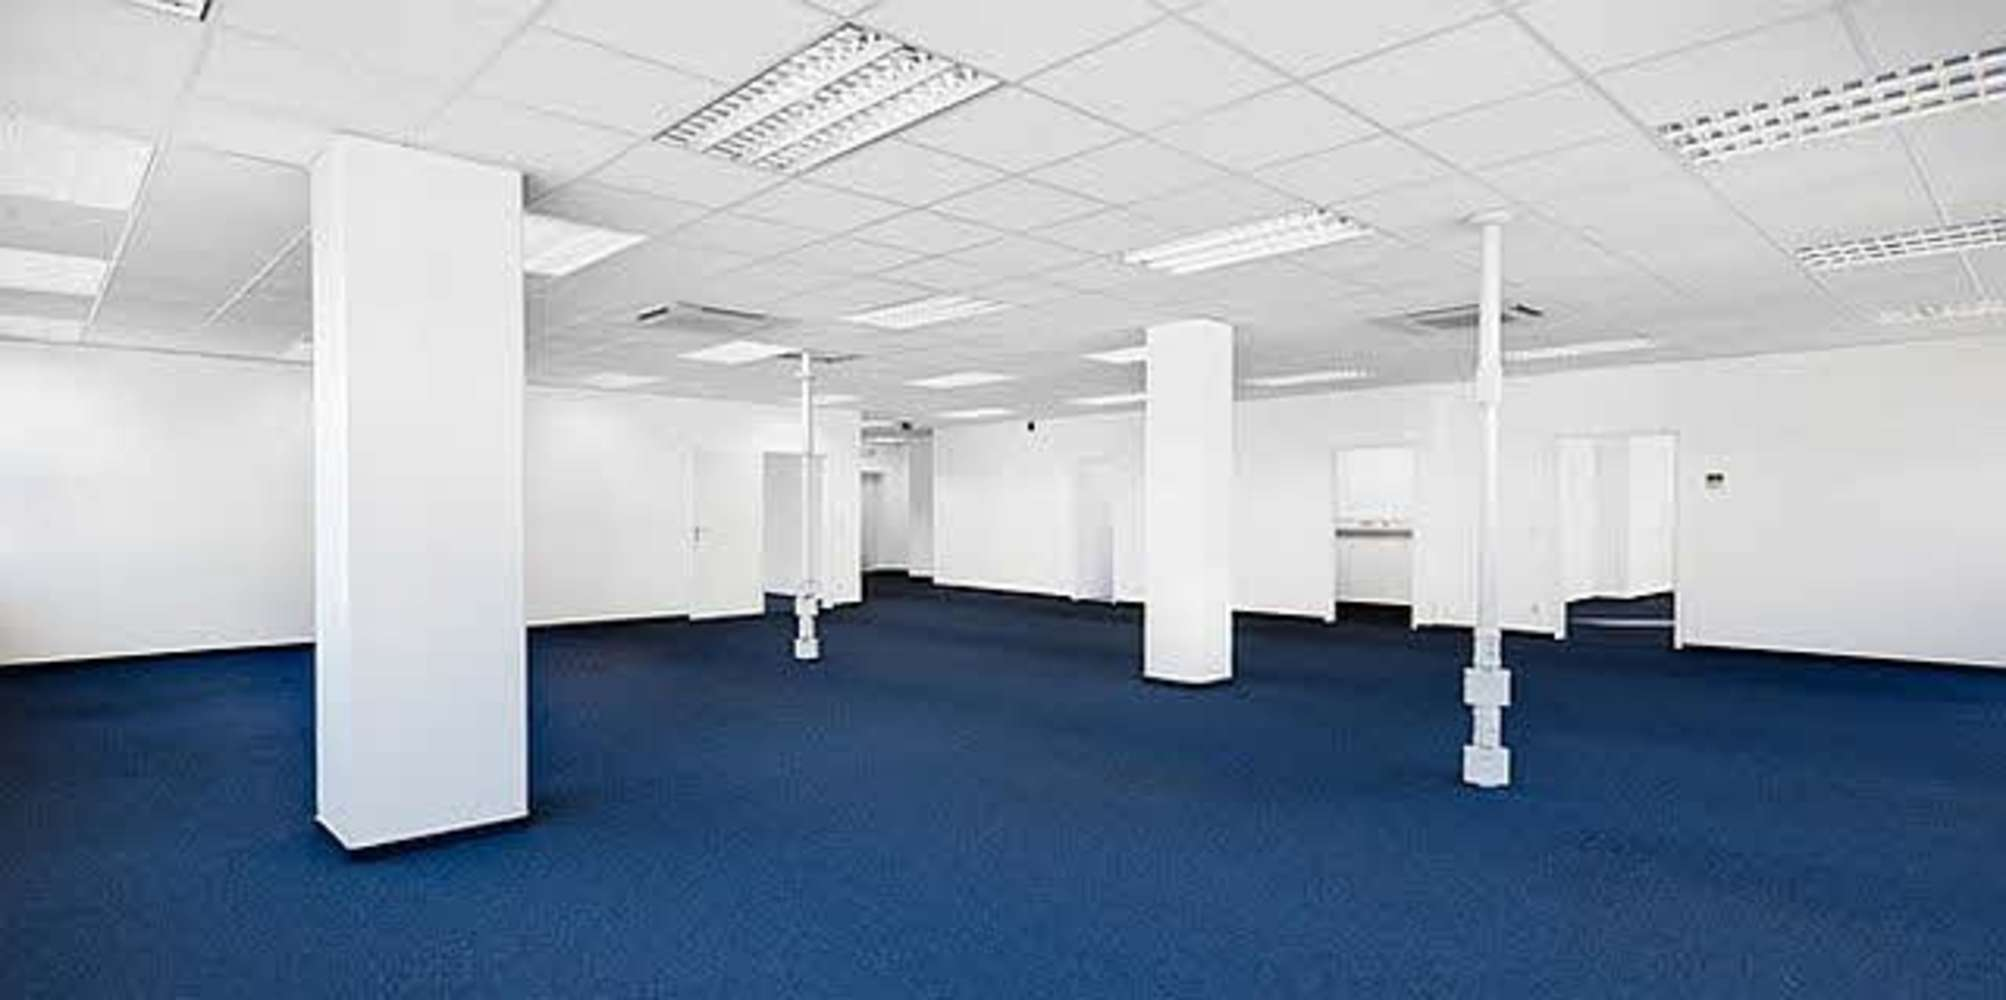 Büros Frankfurt am main, 60437 - Büro - Frankfurt am Main, Nieder-Eschbach - F2400 - 9534697